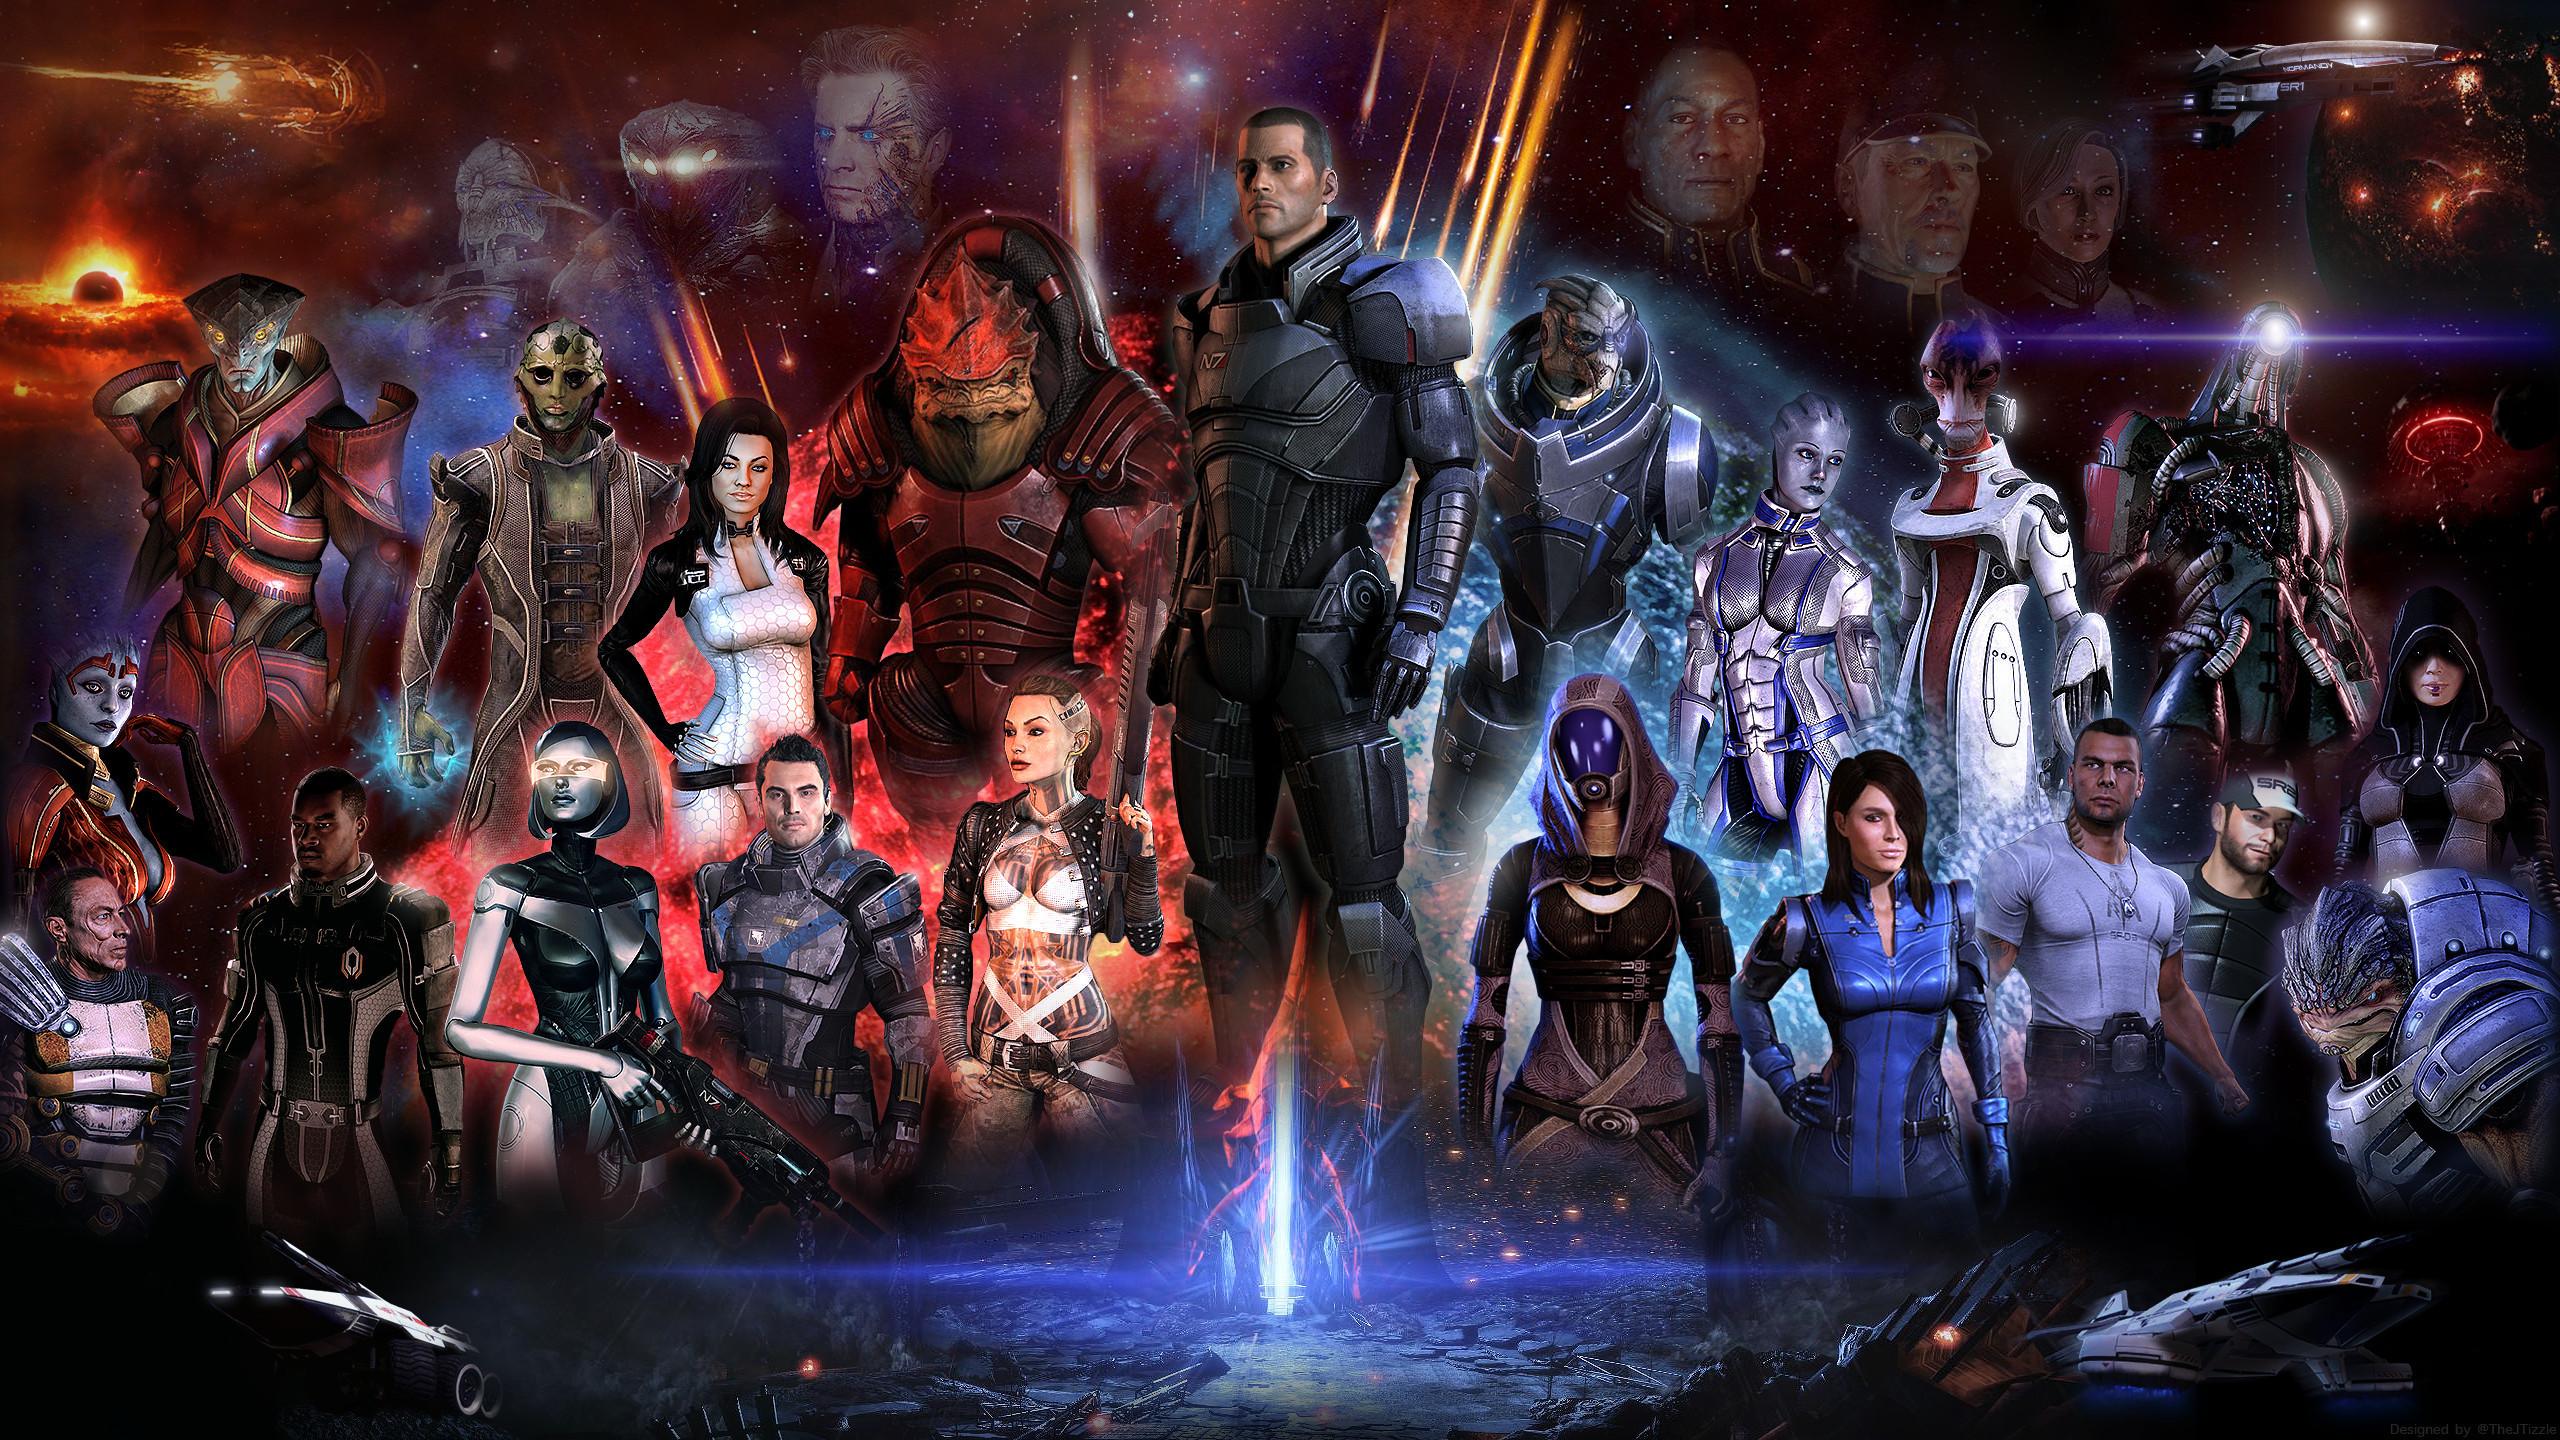 401 Mass Effect HD Wallpapers | Backgrounds - Wallpaper Abyss